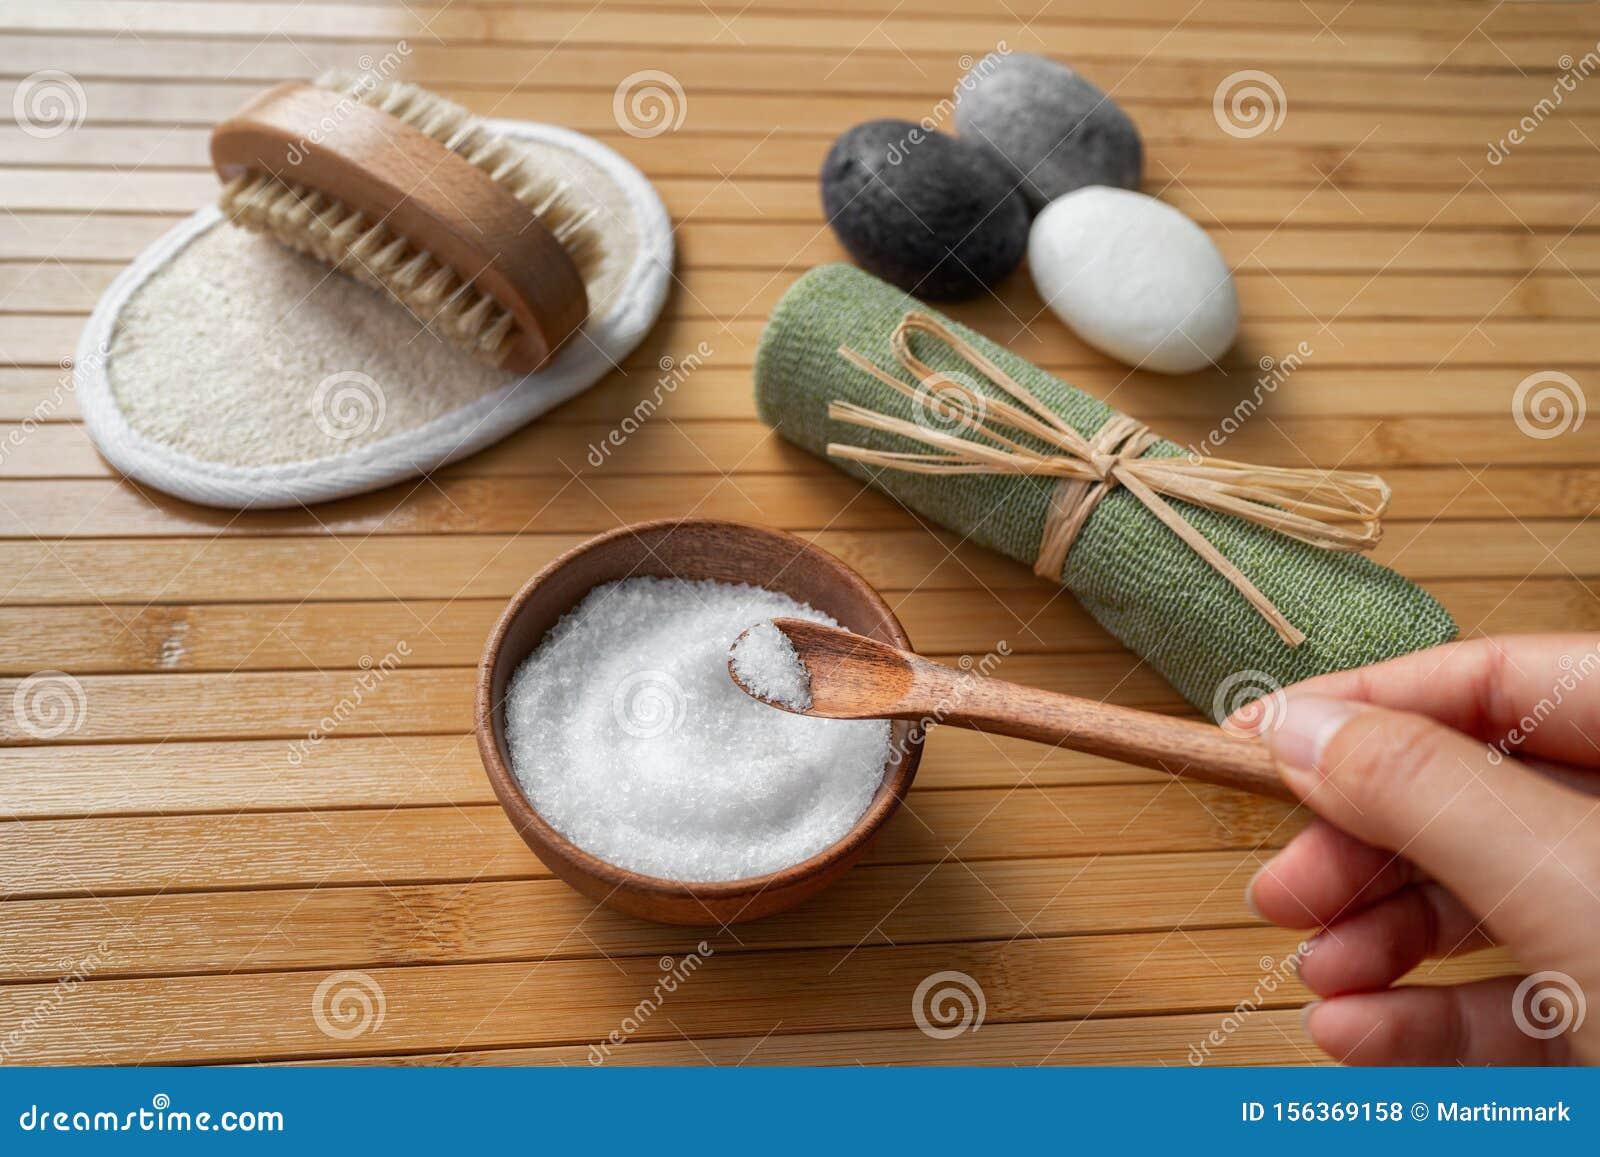 epsom salt bath water turns brown